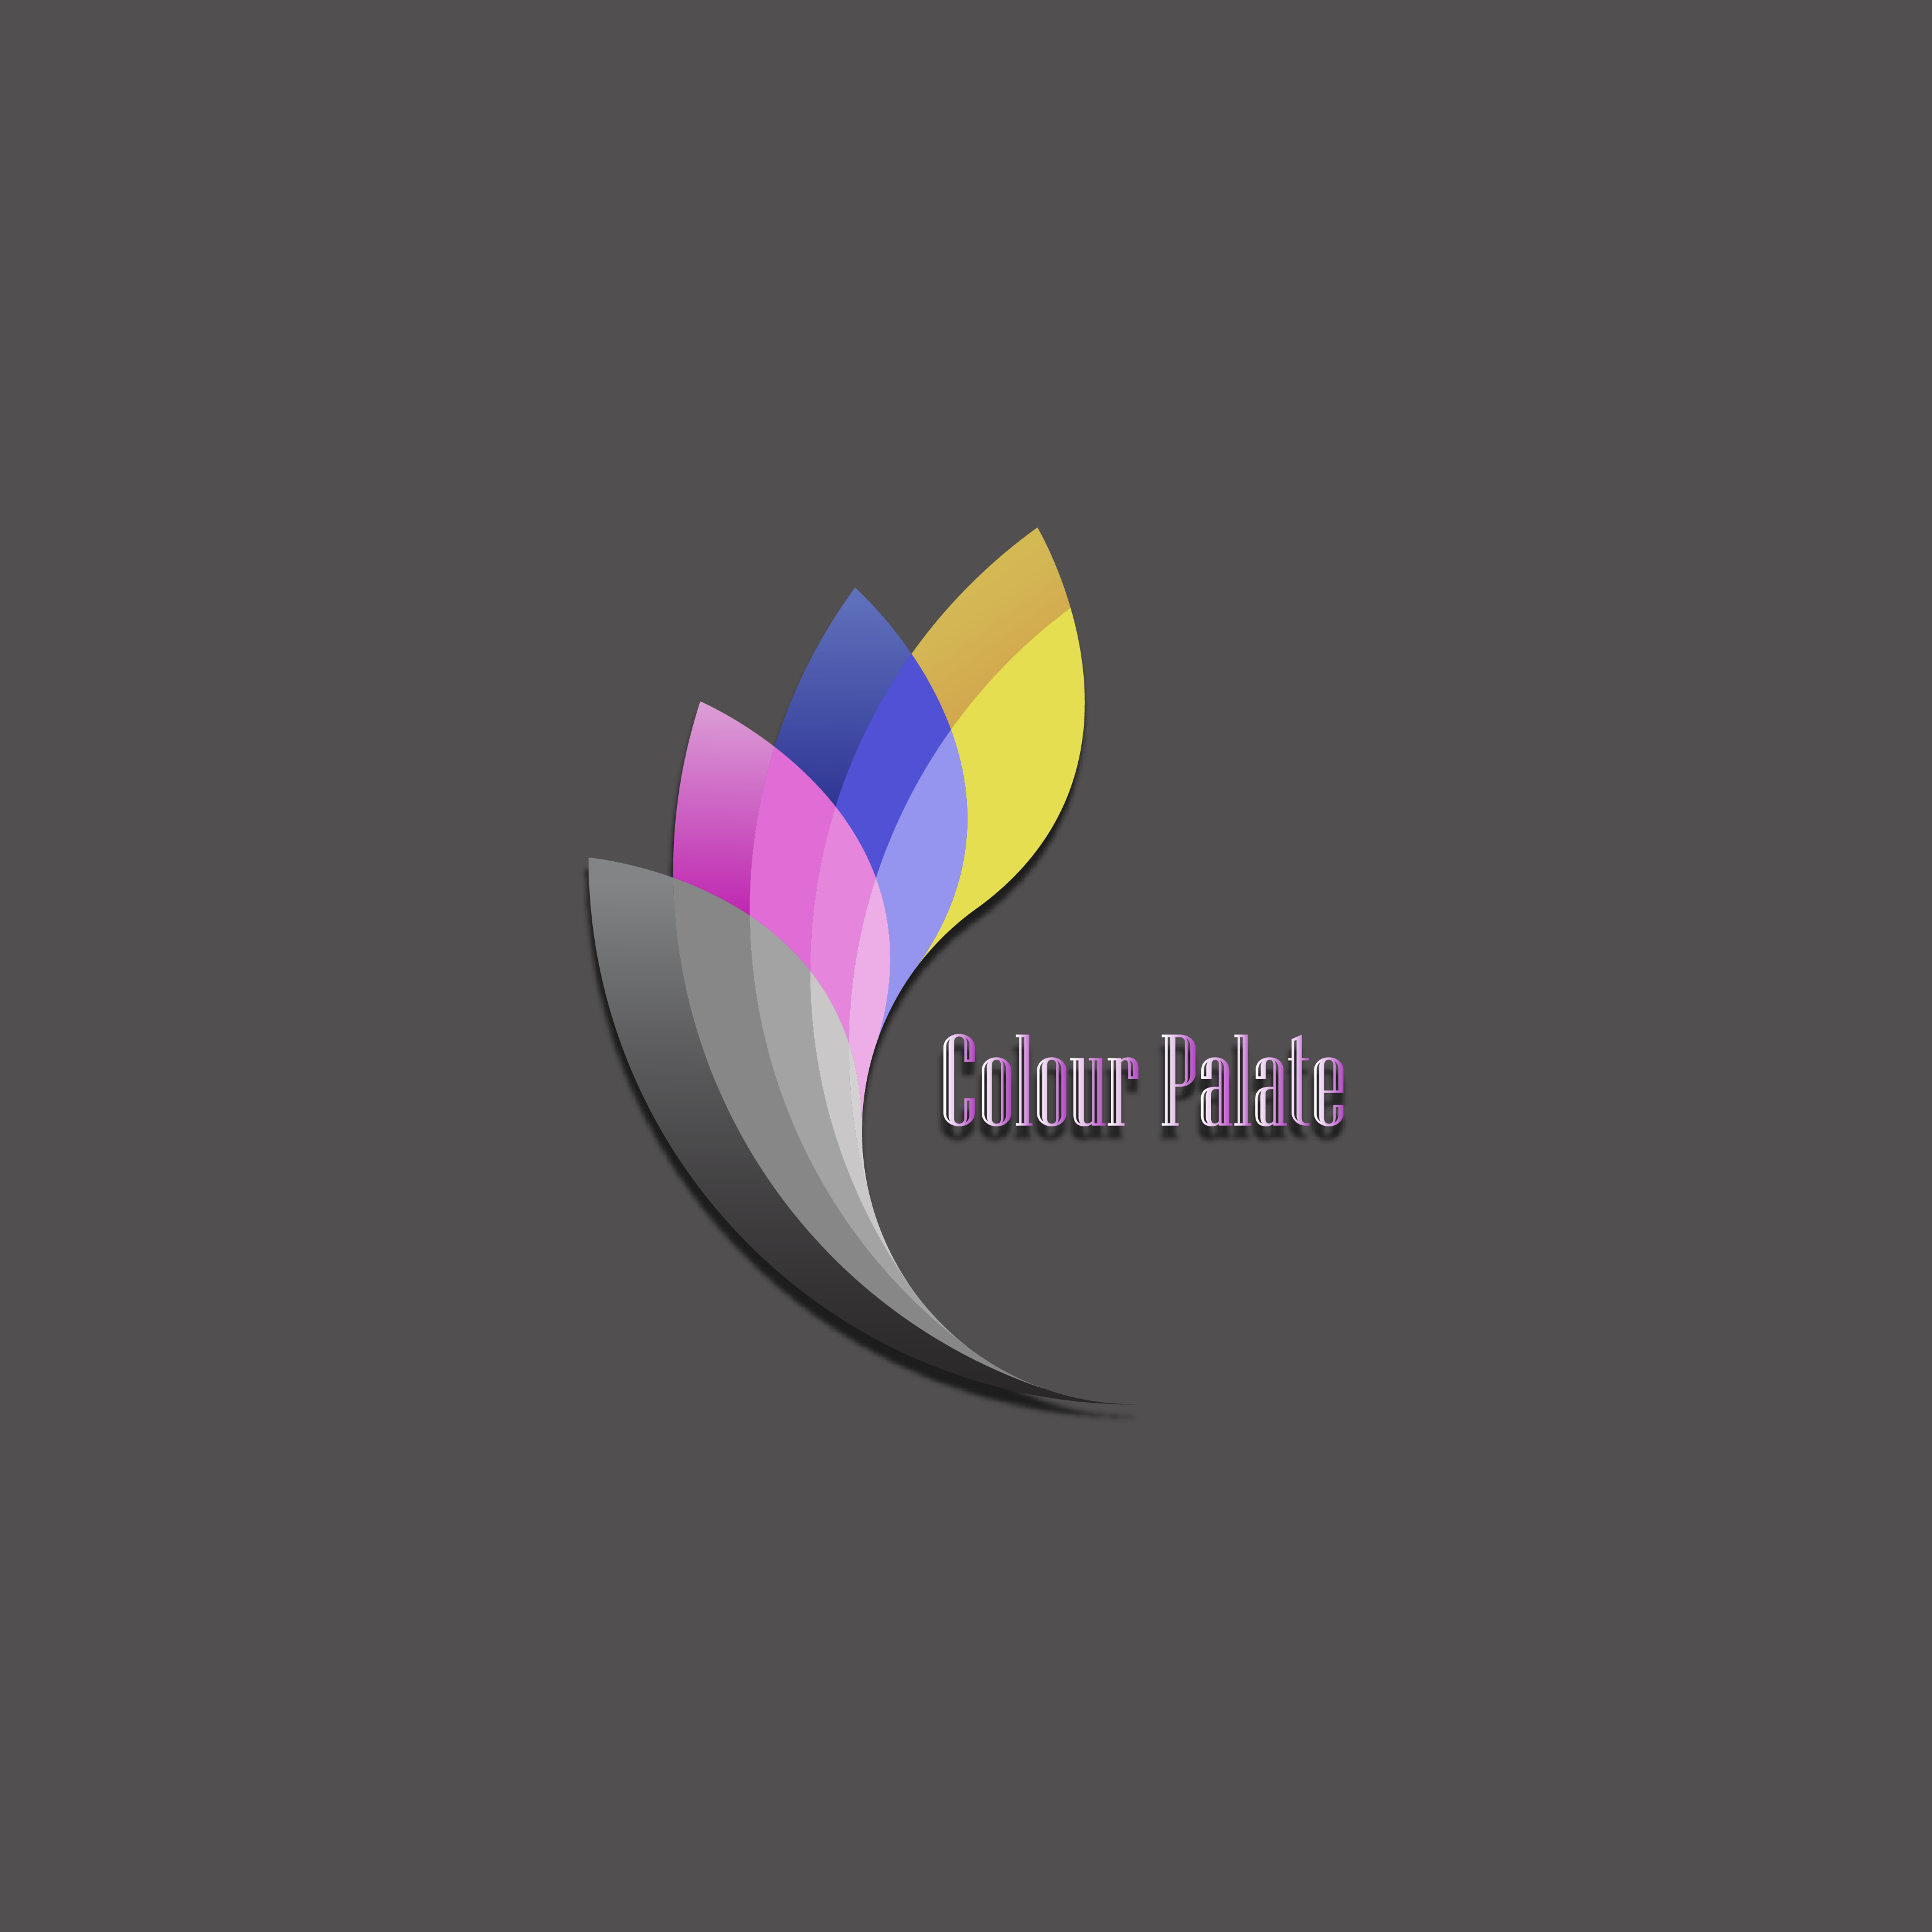 I will do professional and creative 2 logo designs